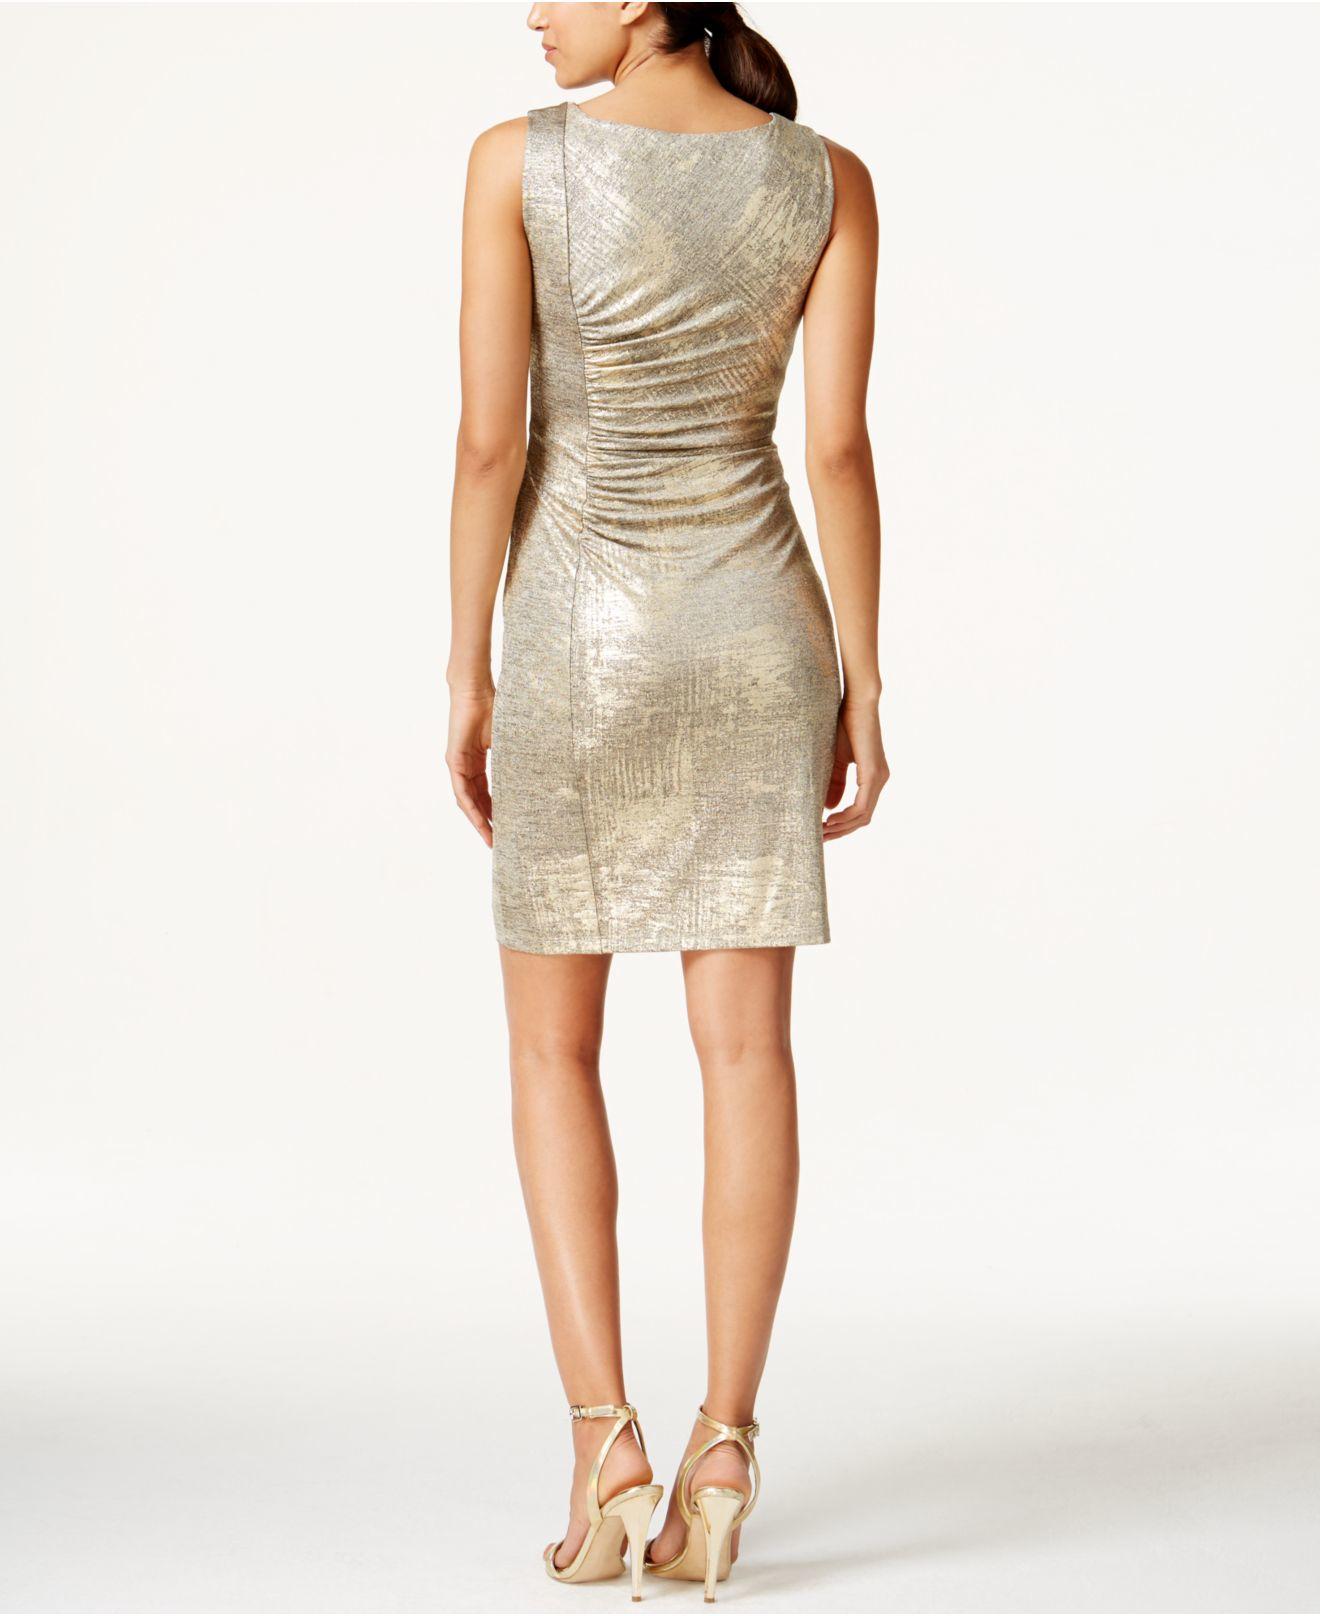 Calvin klein Ruched Metallic Sheath Dress in Metallic | Lyst